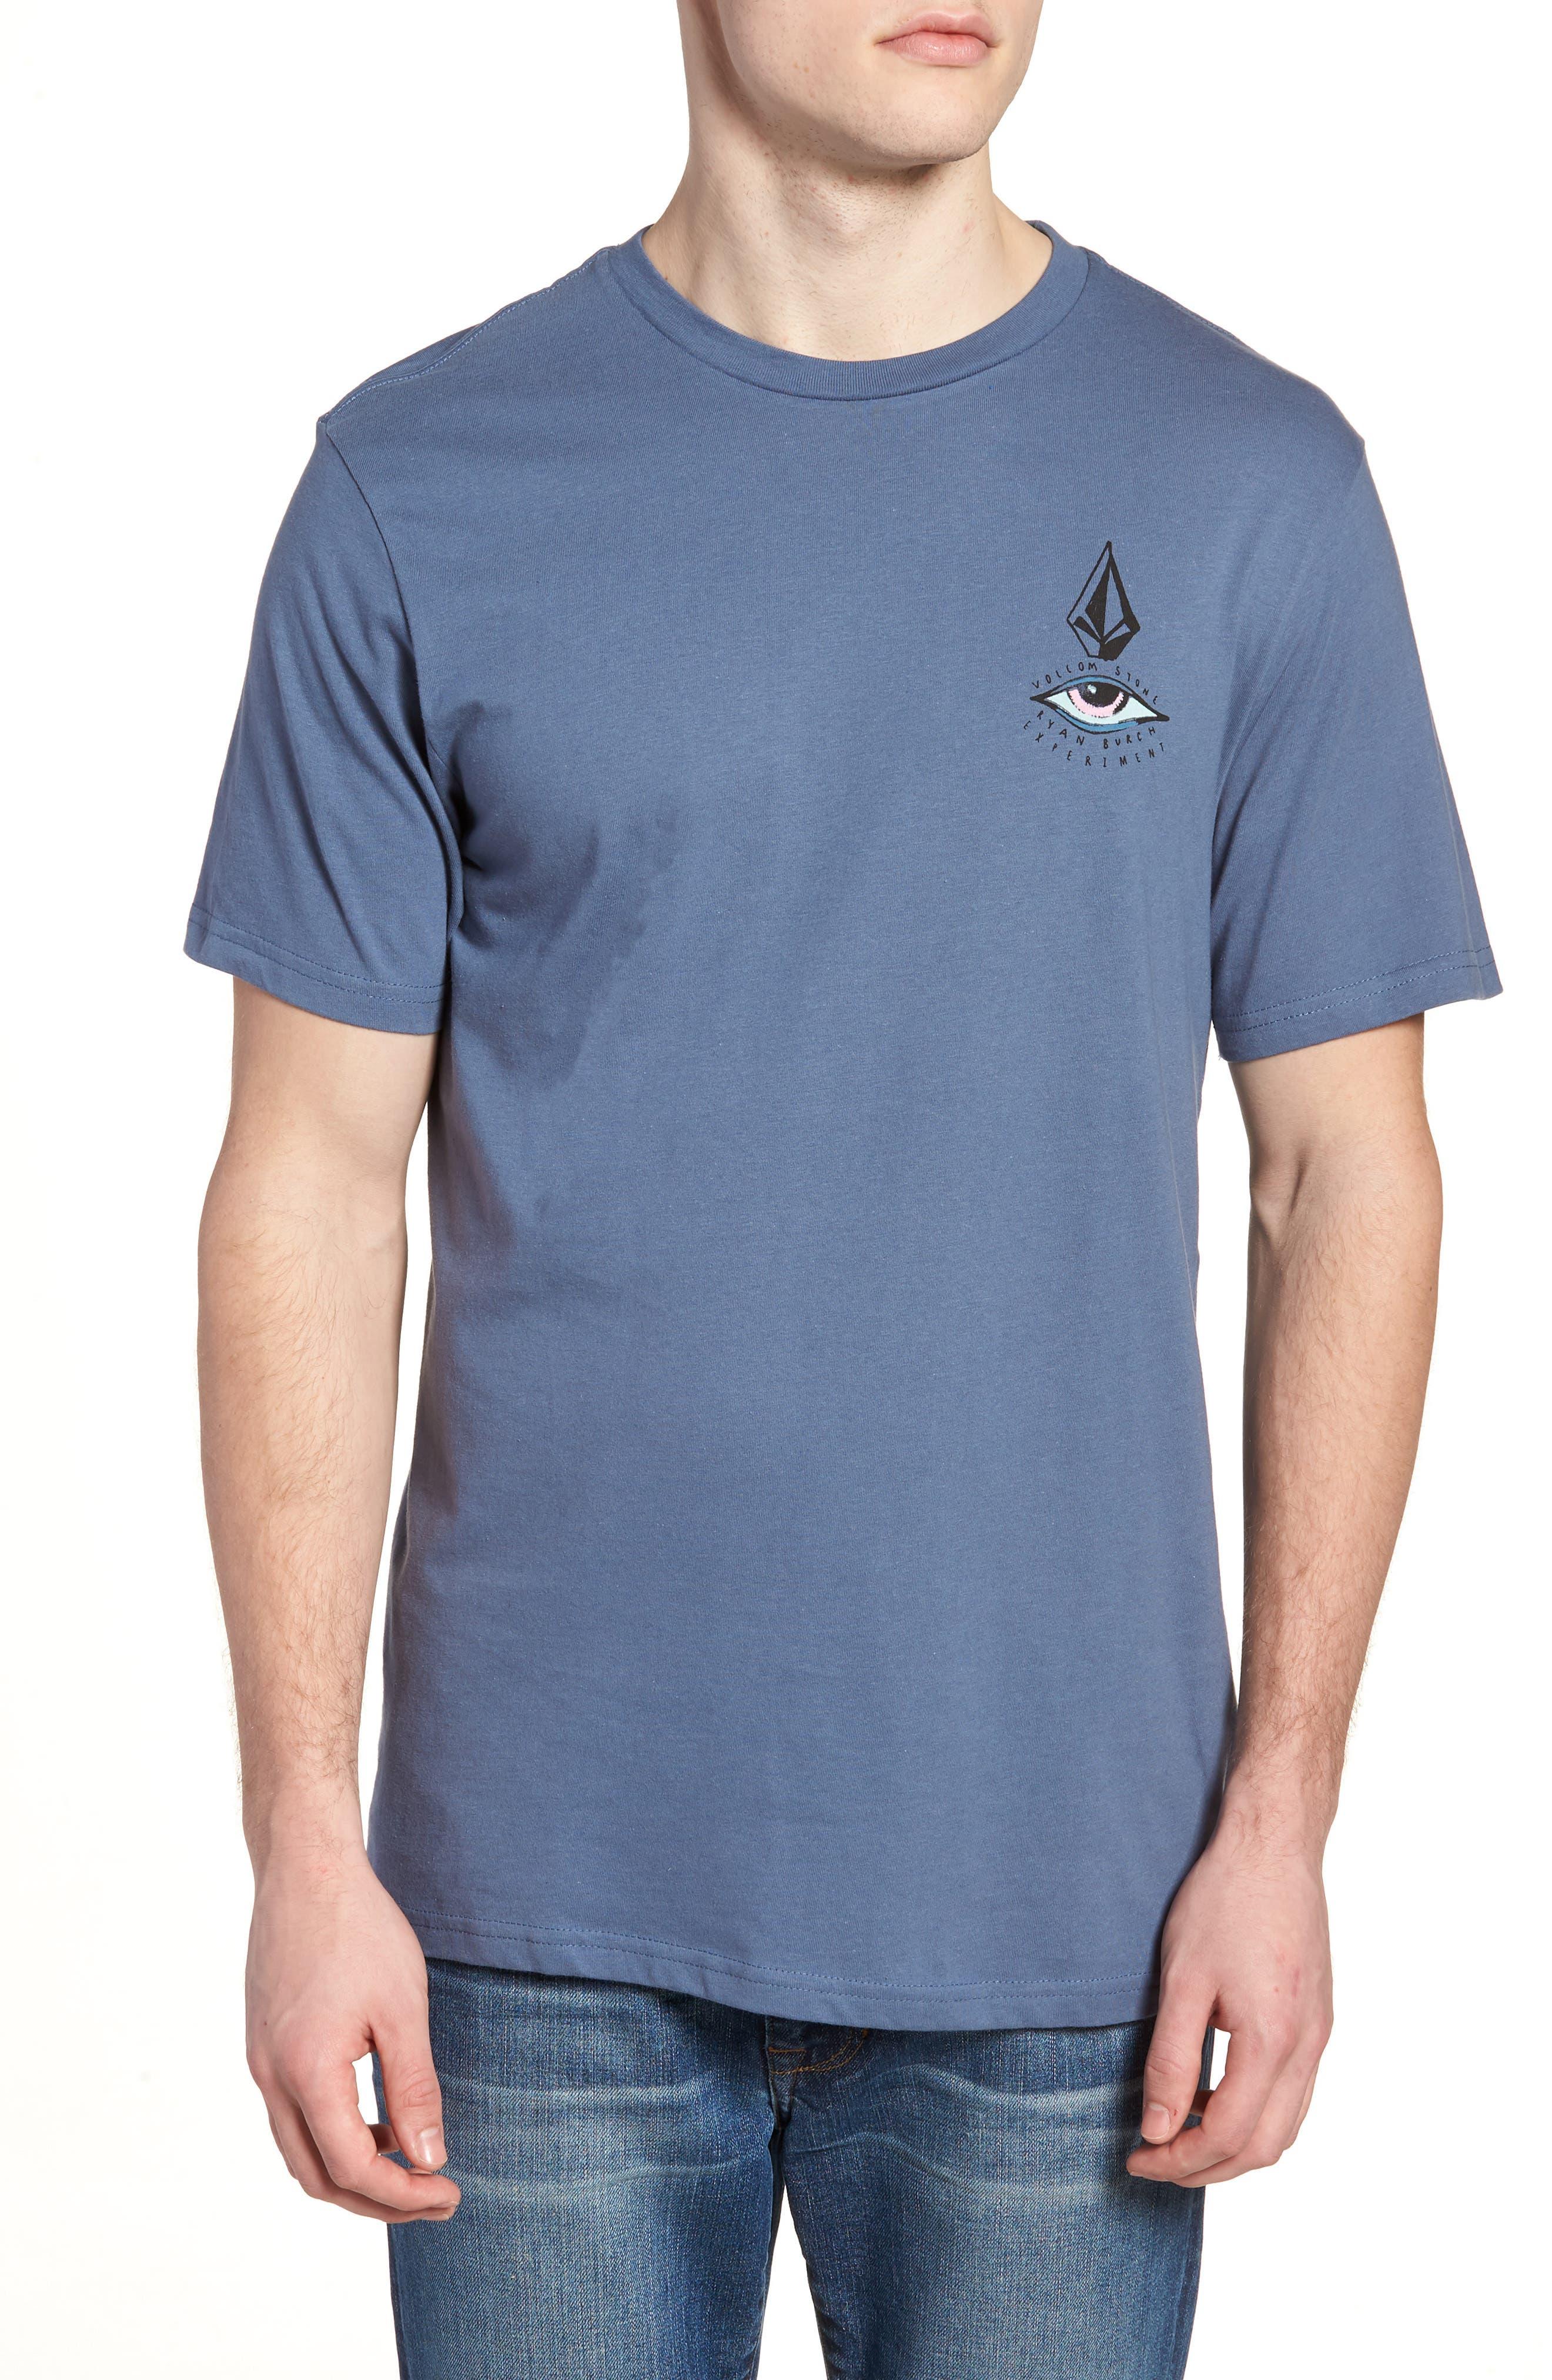 Burch Eye Graphic T-Shirt,                         Main,                         color, Deep Blue